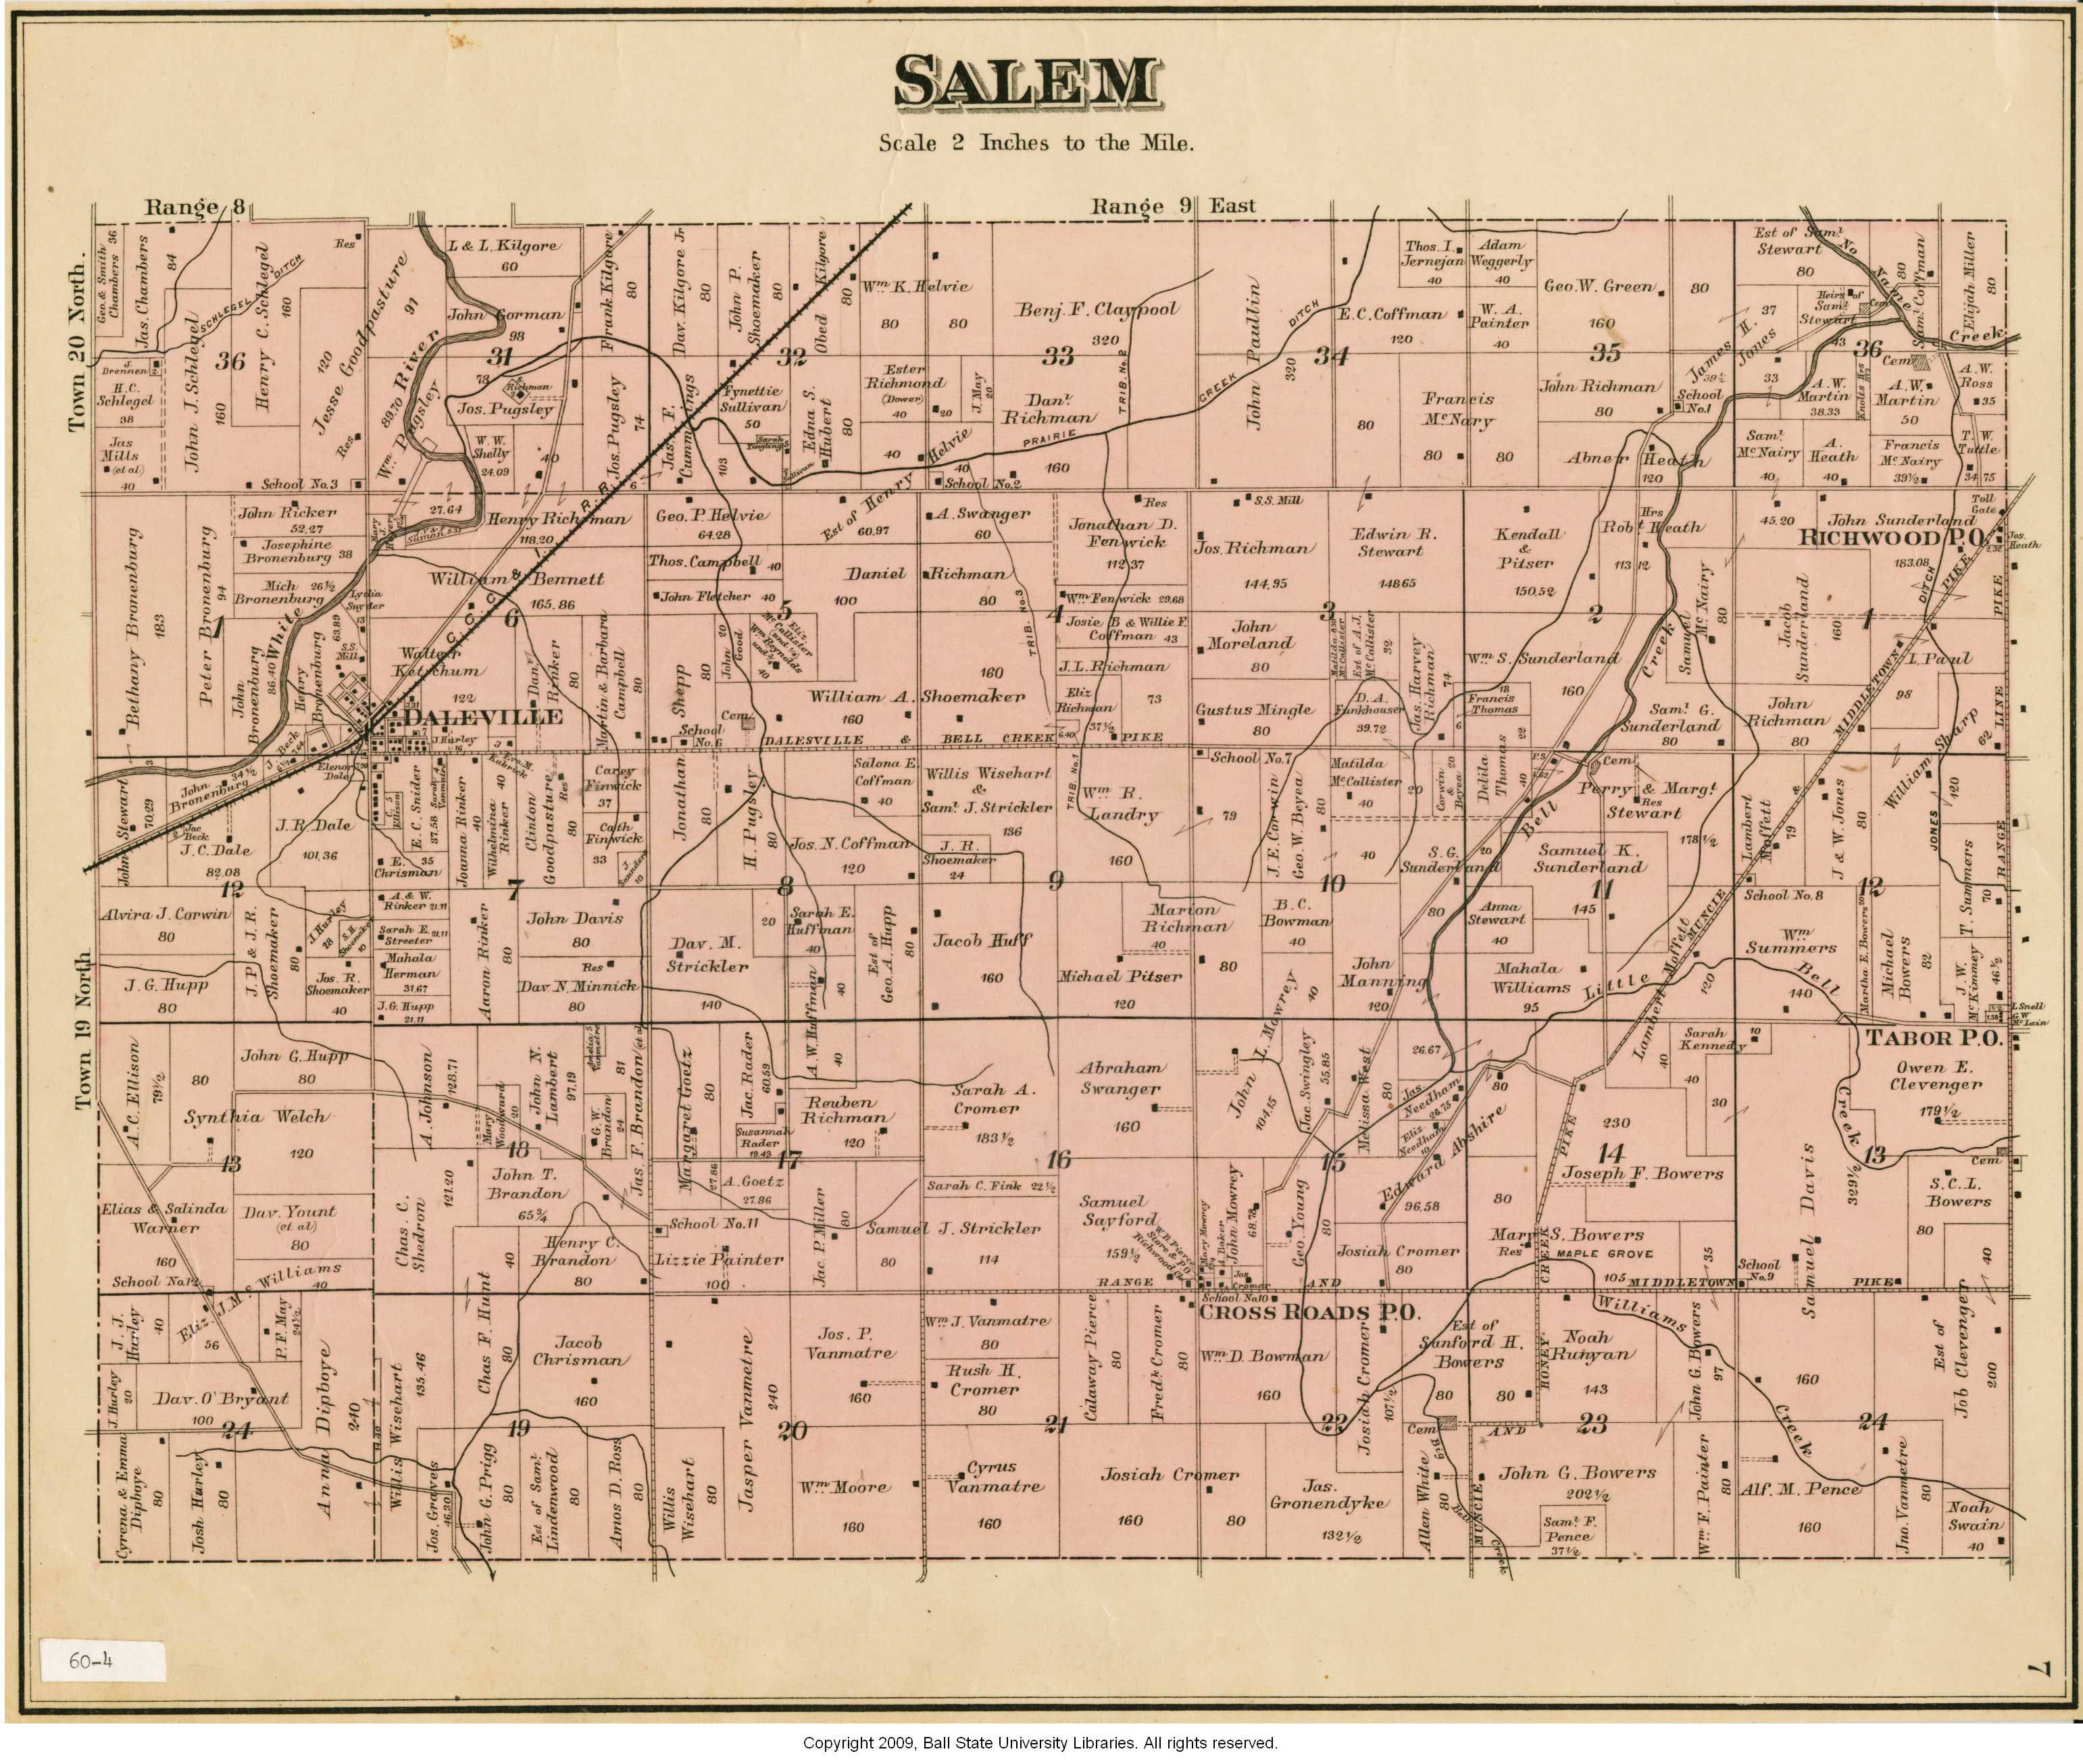 Map of Salem Township (Delaware County, Indiana) - Indiana ... Salem Indiana Map on salem golf club, salem in october, salem mall, salem on halloween, salem logo, salem capitol building, salem india, salem tv,